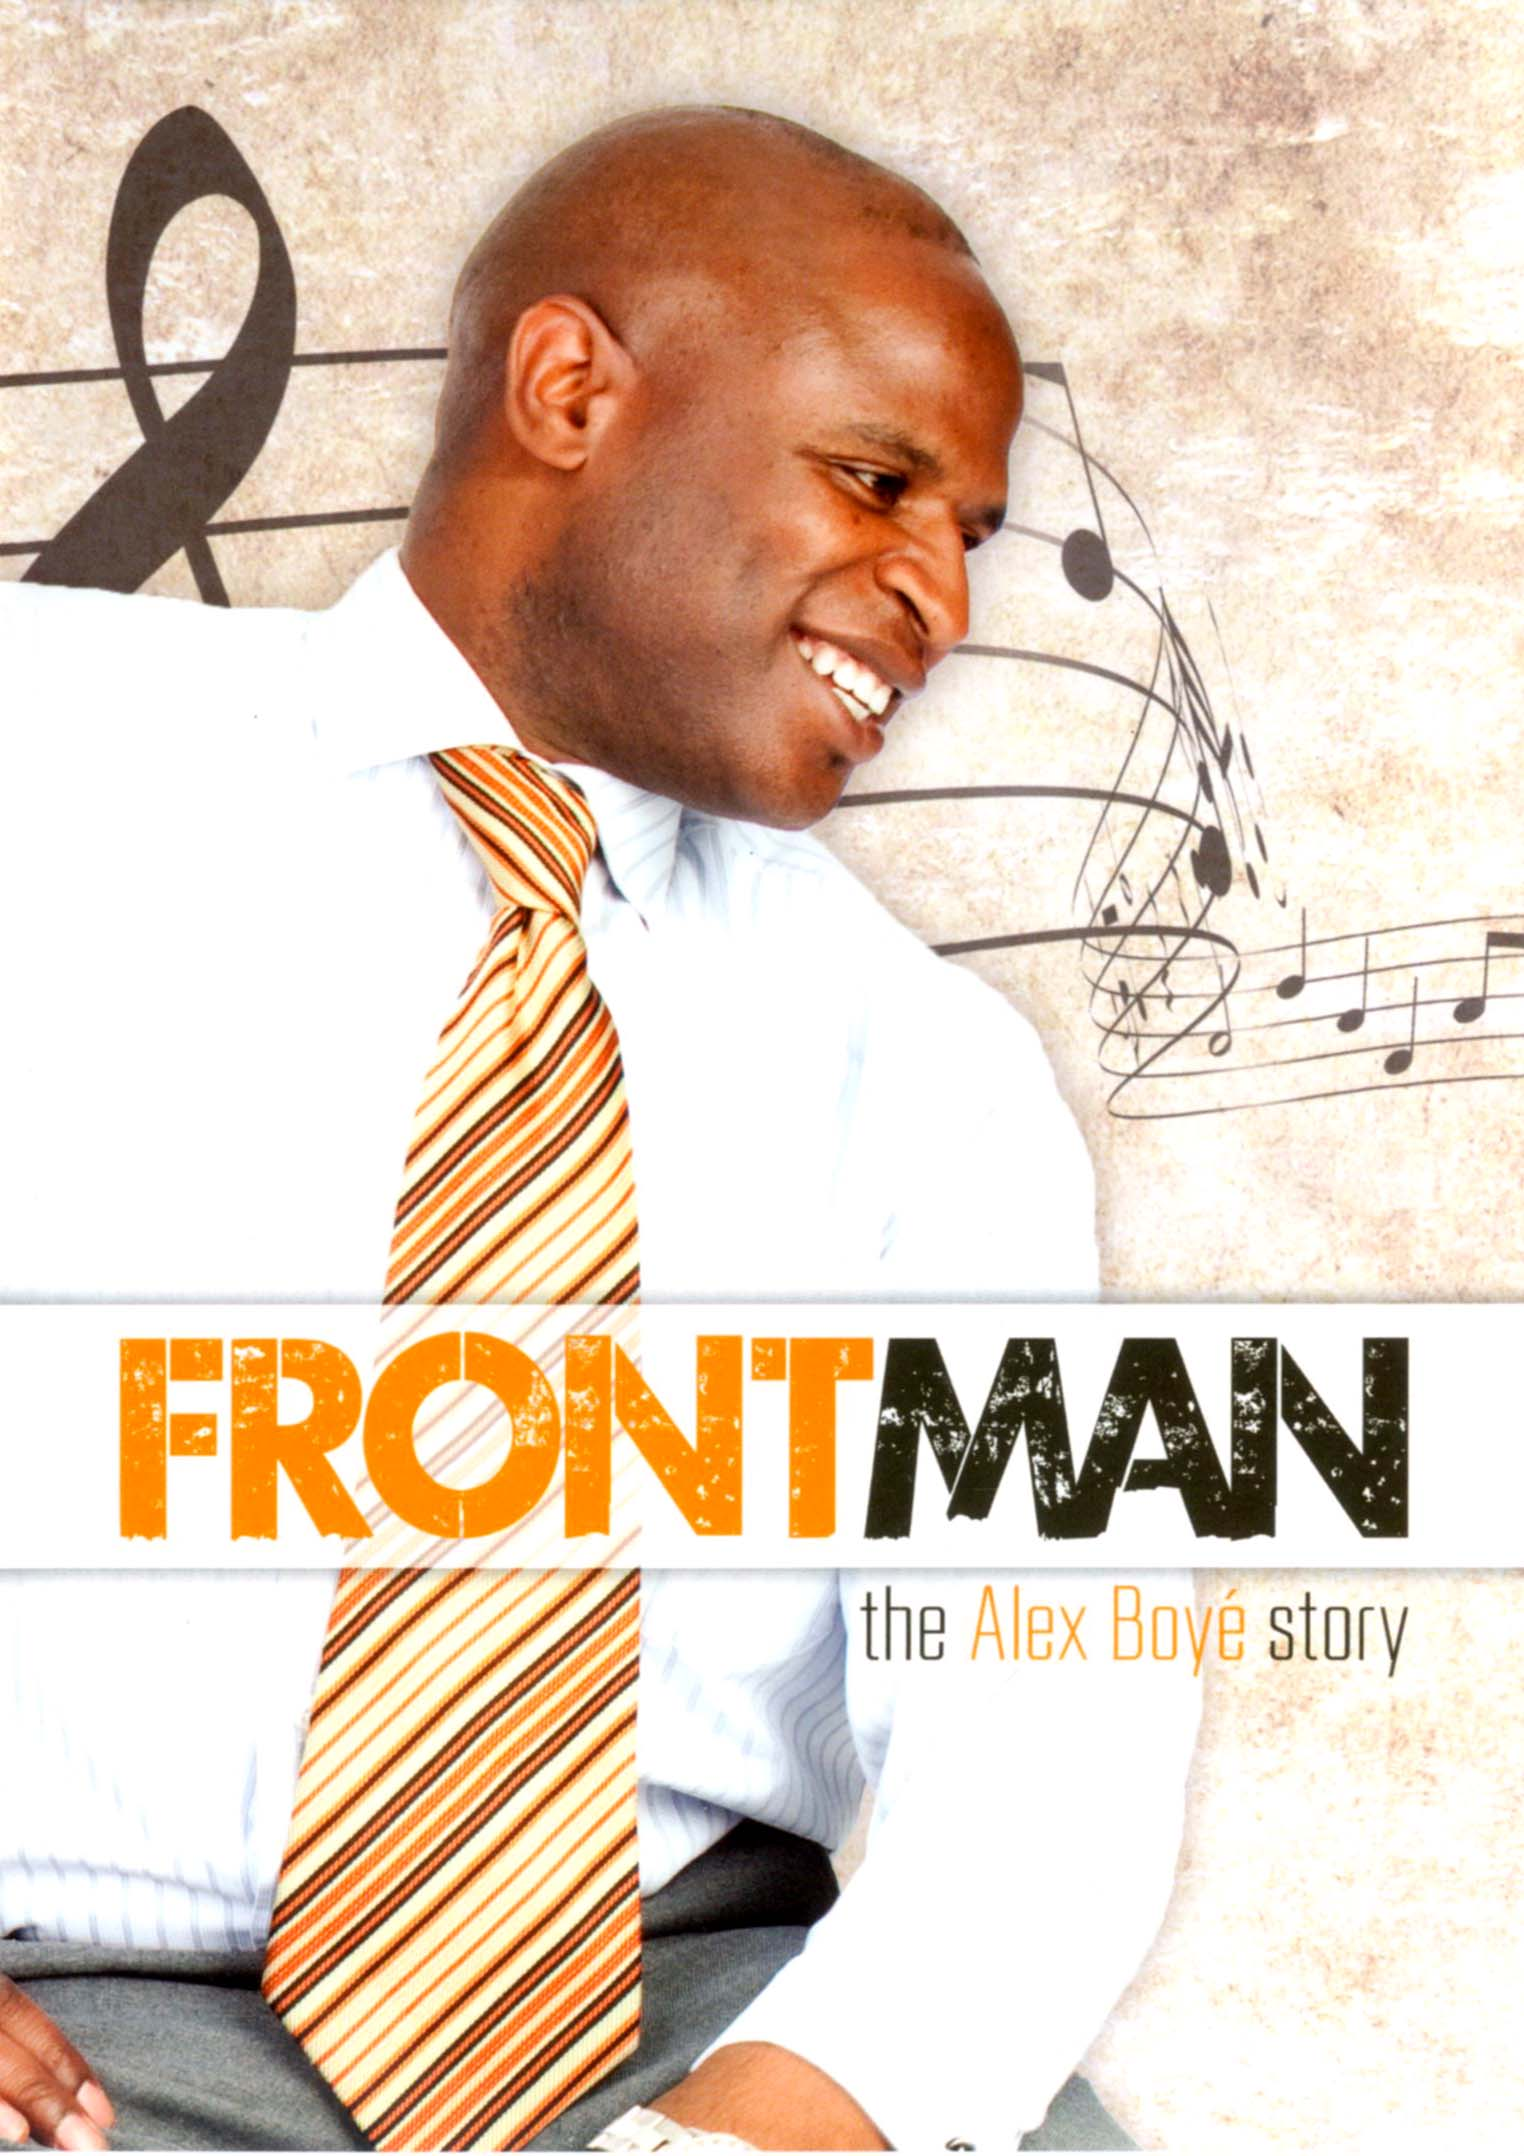 Front Man: The Alex Boyé Story